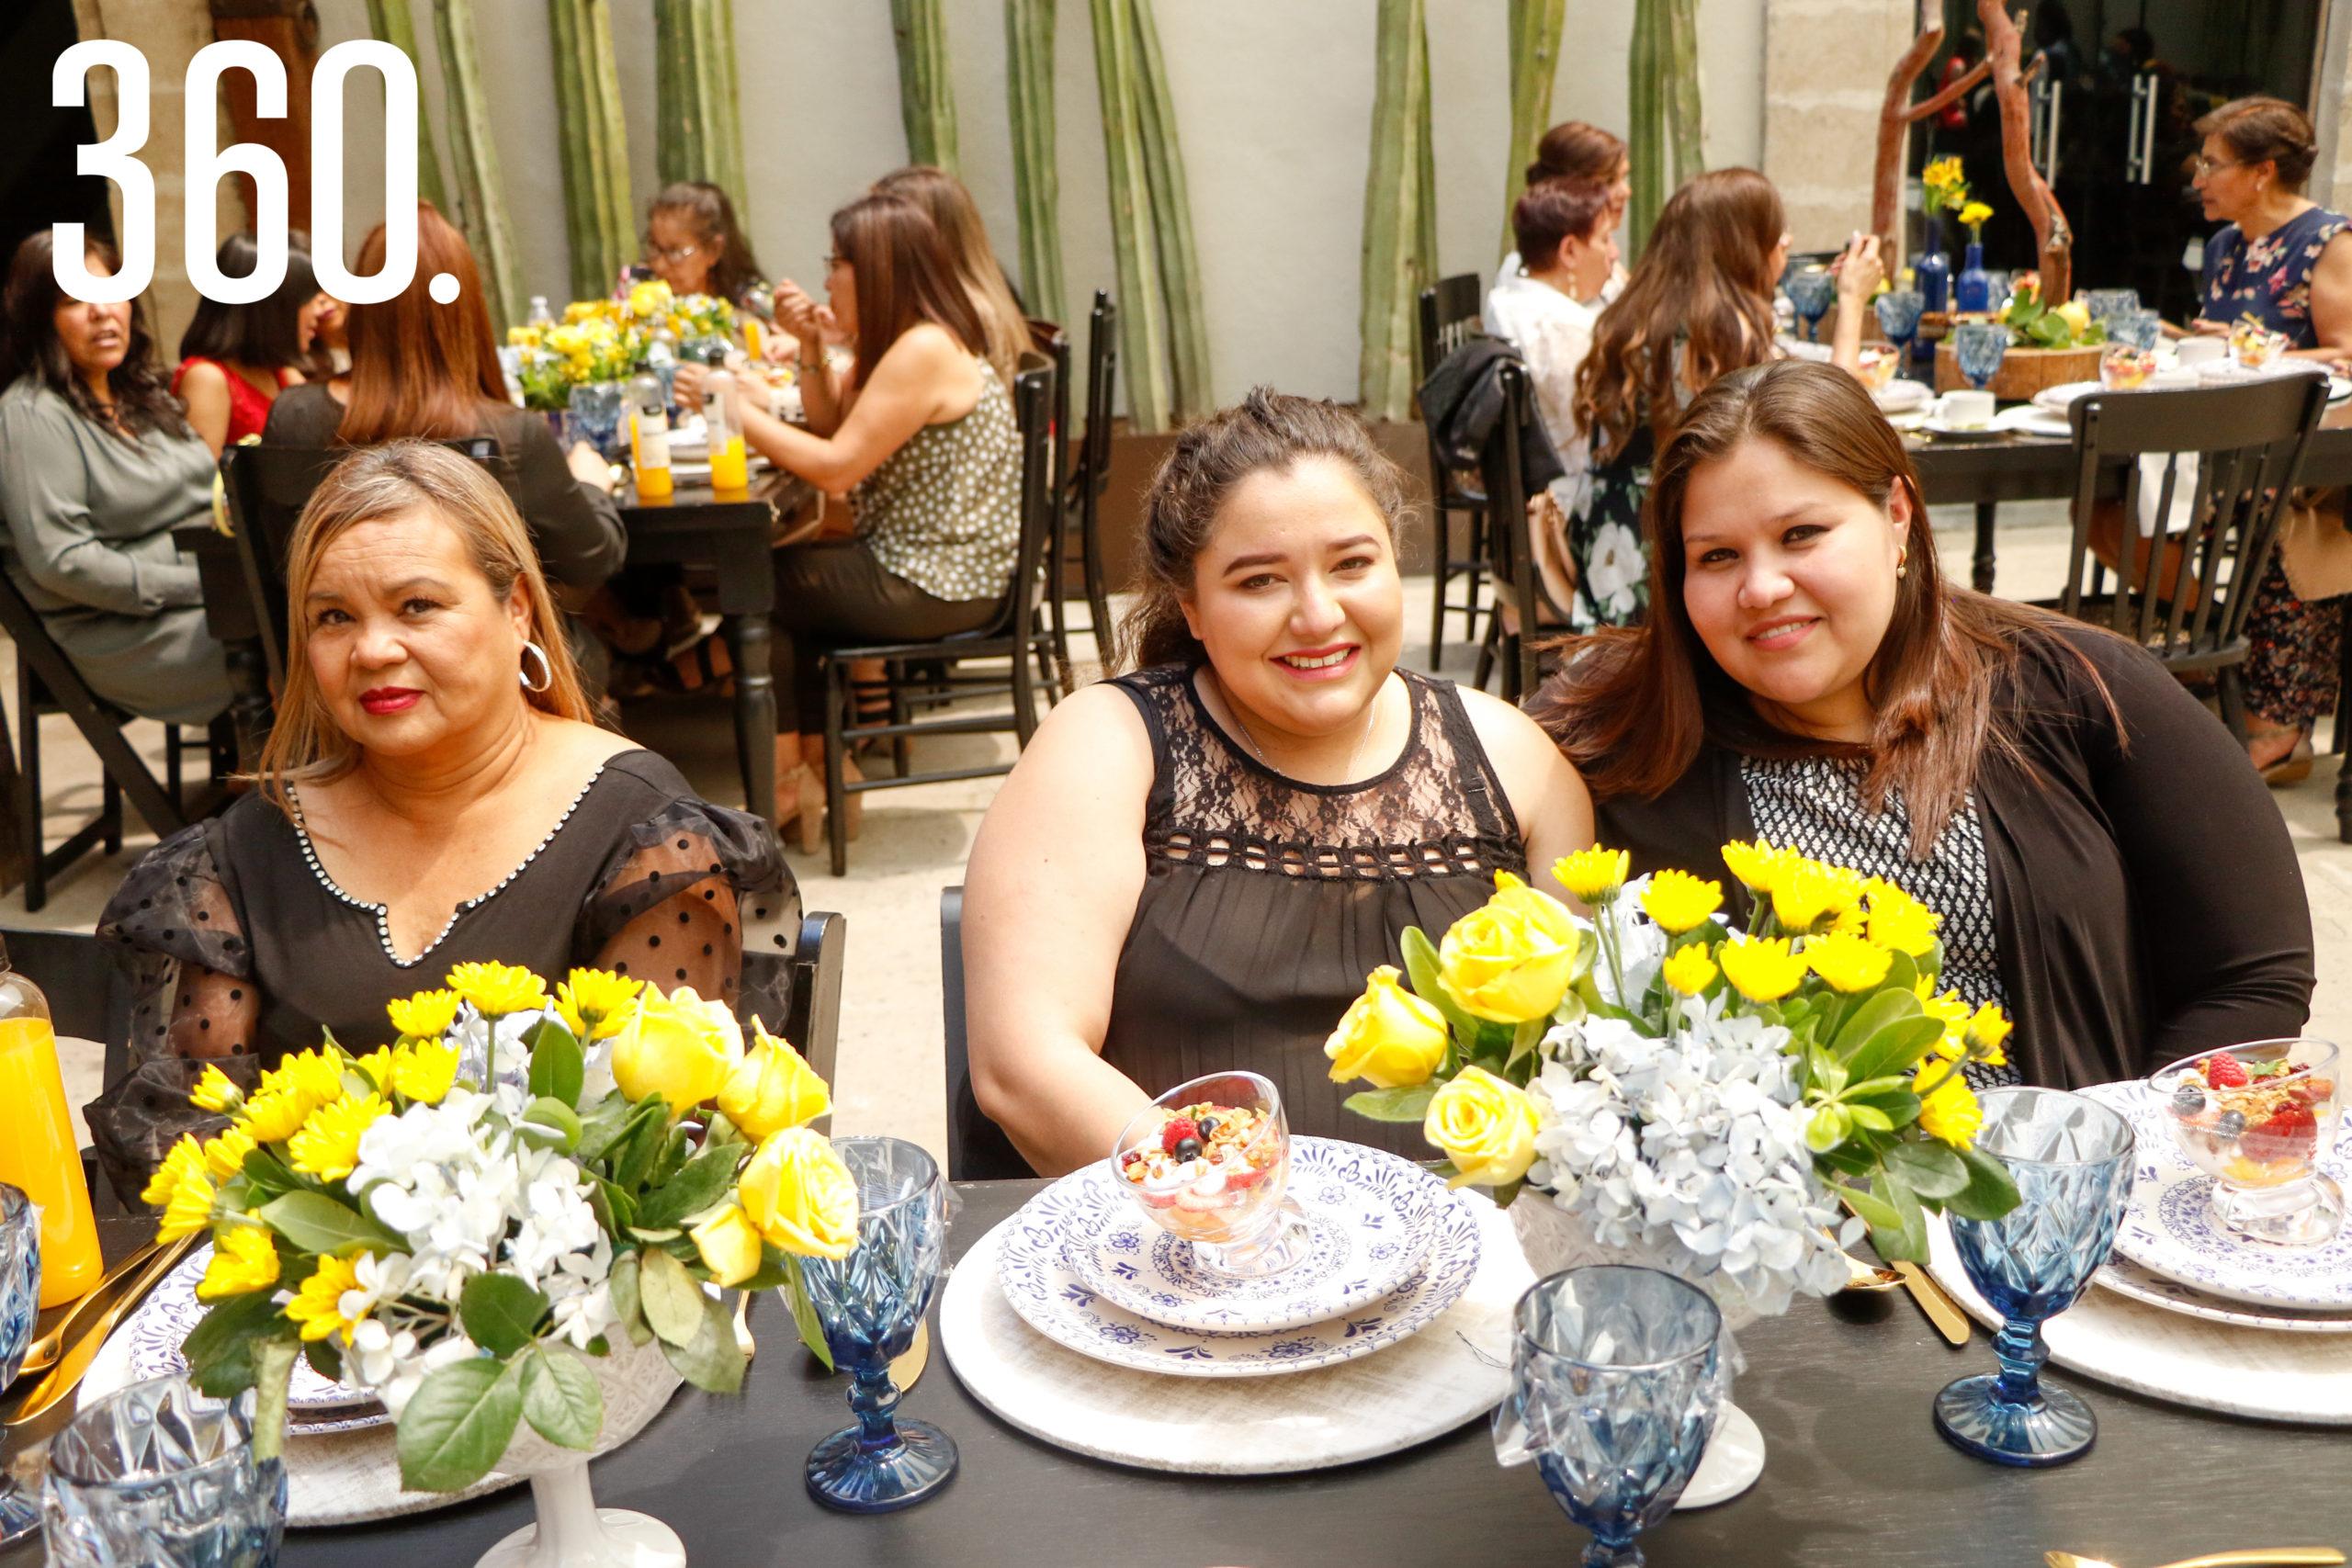 Laura Rodríguez, Saraí Alonso y Alicia Alonso.